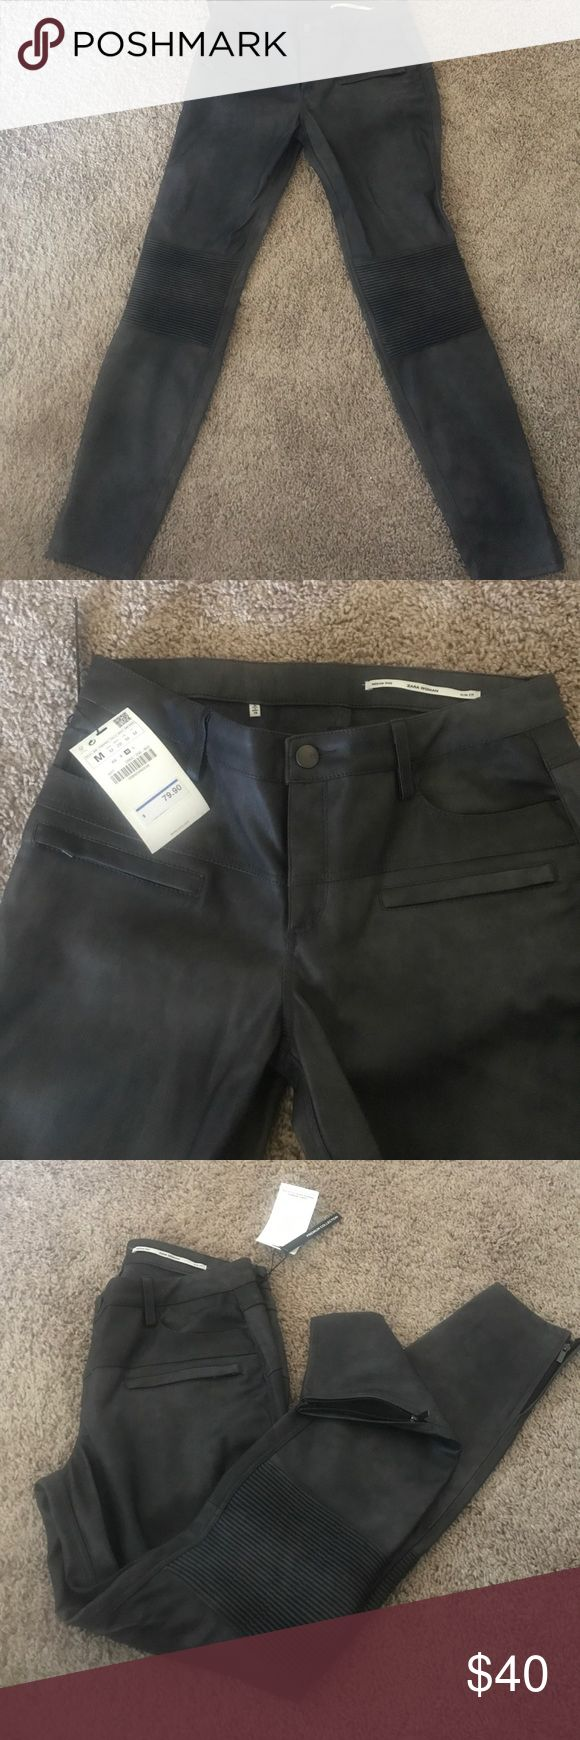 Zara Faux leather biker pants medium Brand new with tags! Zara faux leather biker pants never worn! Tags attached. Zipper detail and the bottom of pants with biker detail at the knee! Grey color size medium Zara Pants Skinny